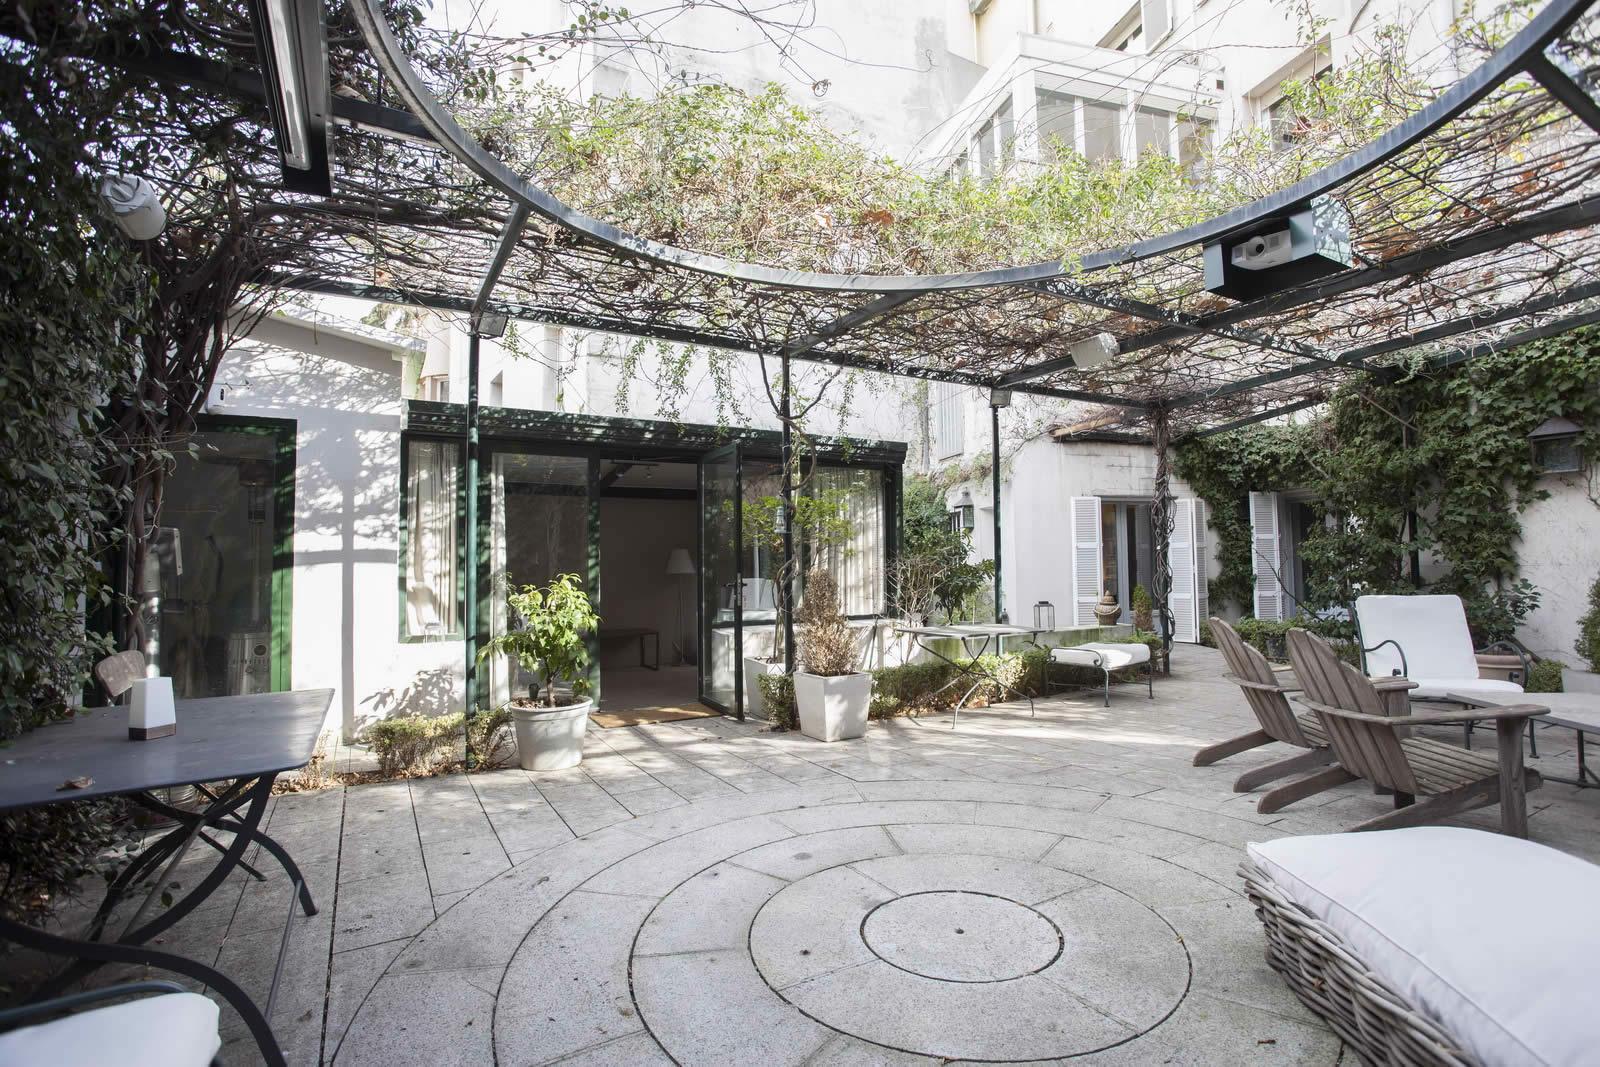 grande-maison-patio-ferme-coeur-quartier-el-viso-a-vendre